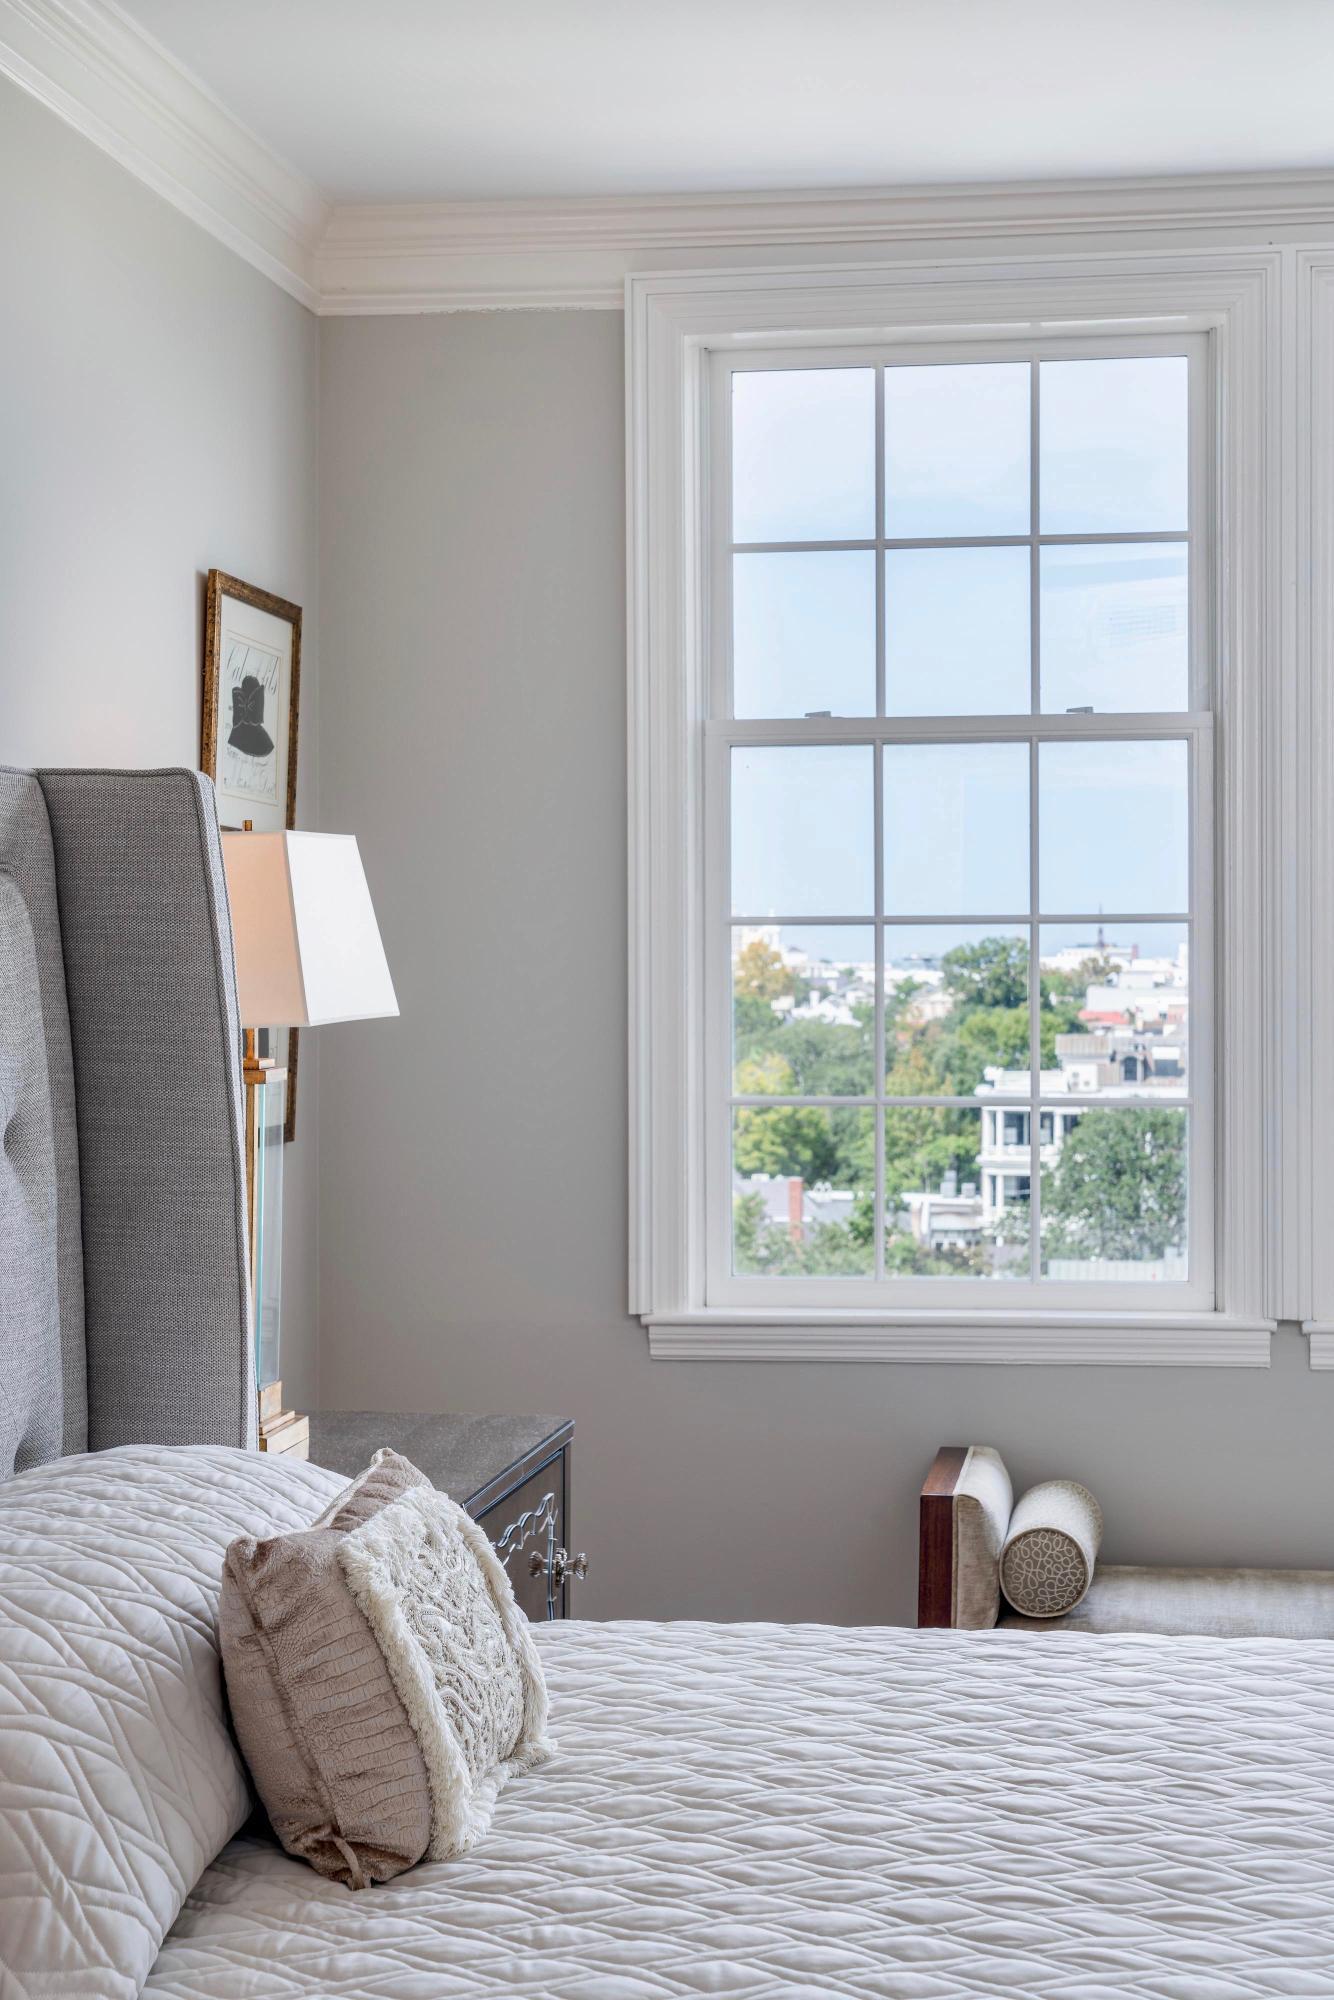 Fort Sumter House Homes For Sale - 1 King, Charleston, SC - 13